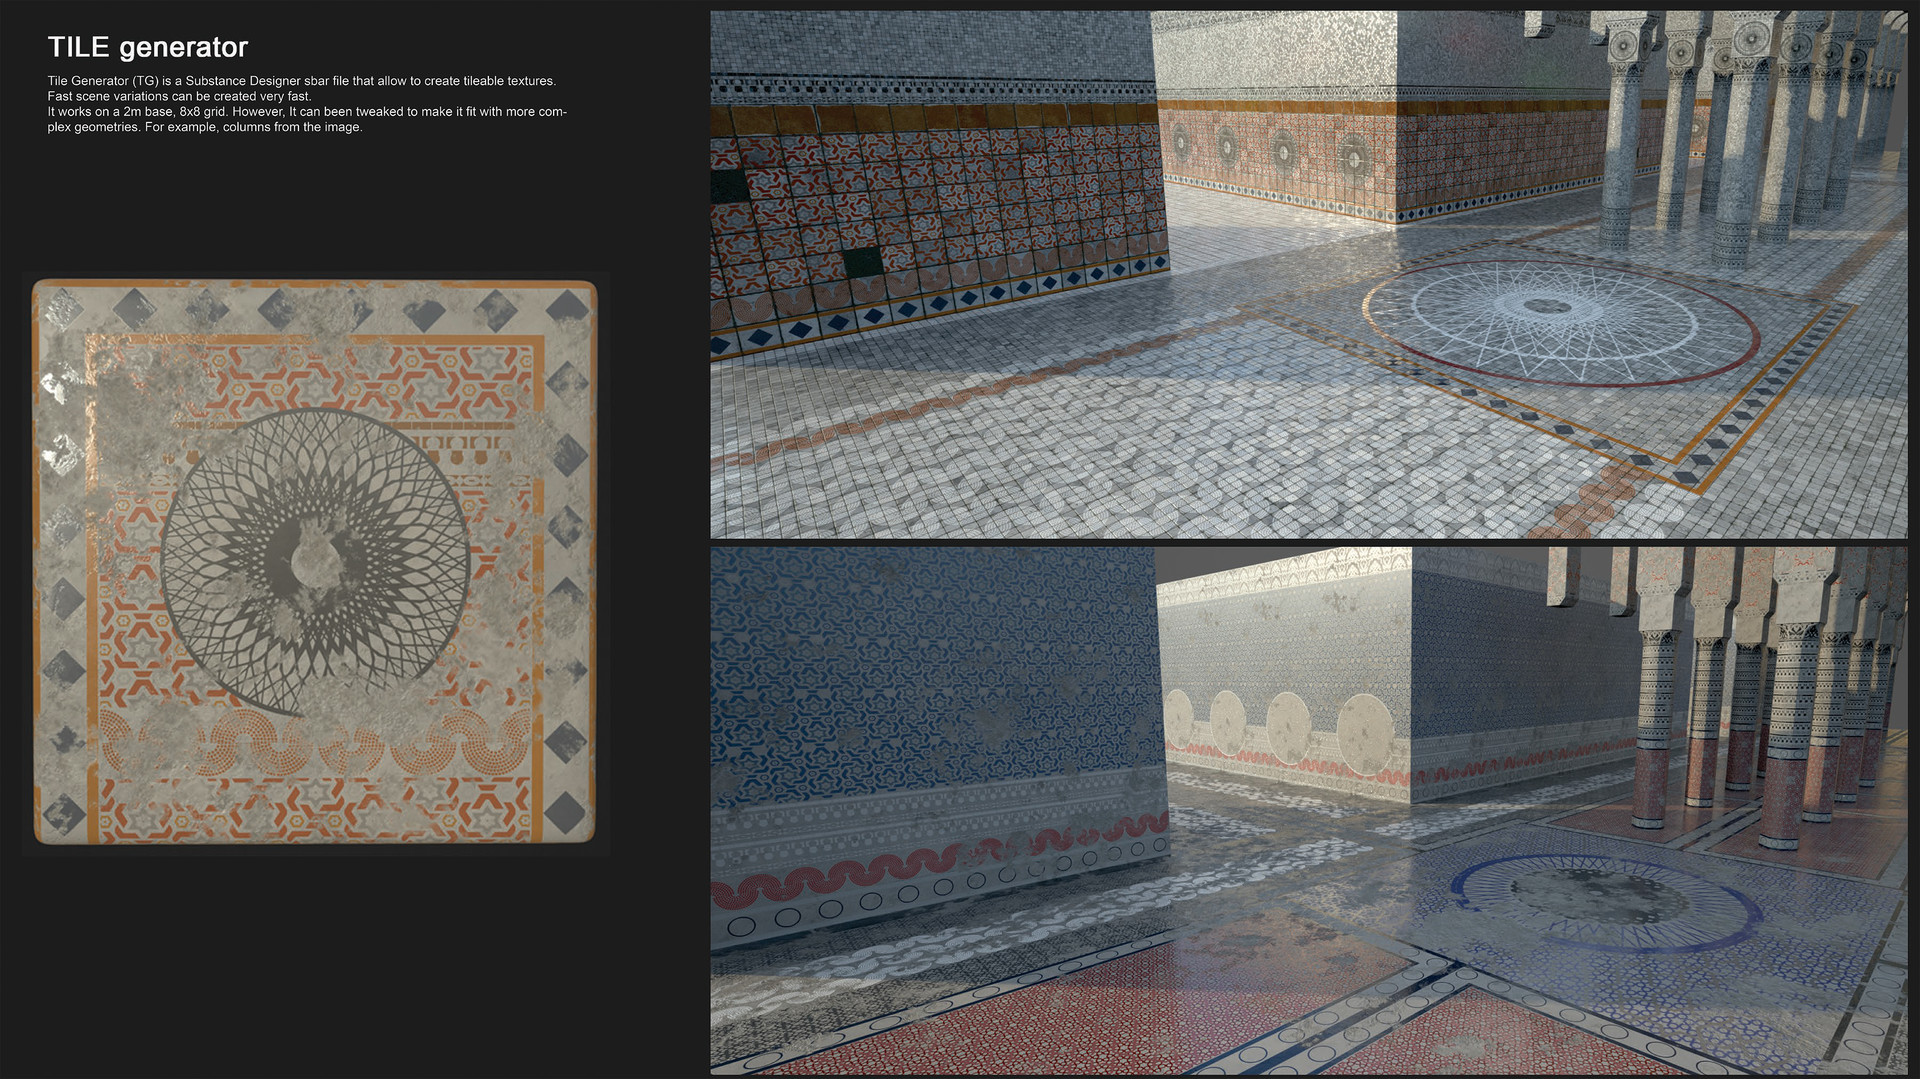 ArtStation - Tile generator, daniel diaz saez